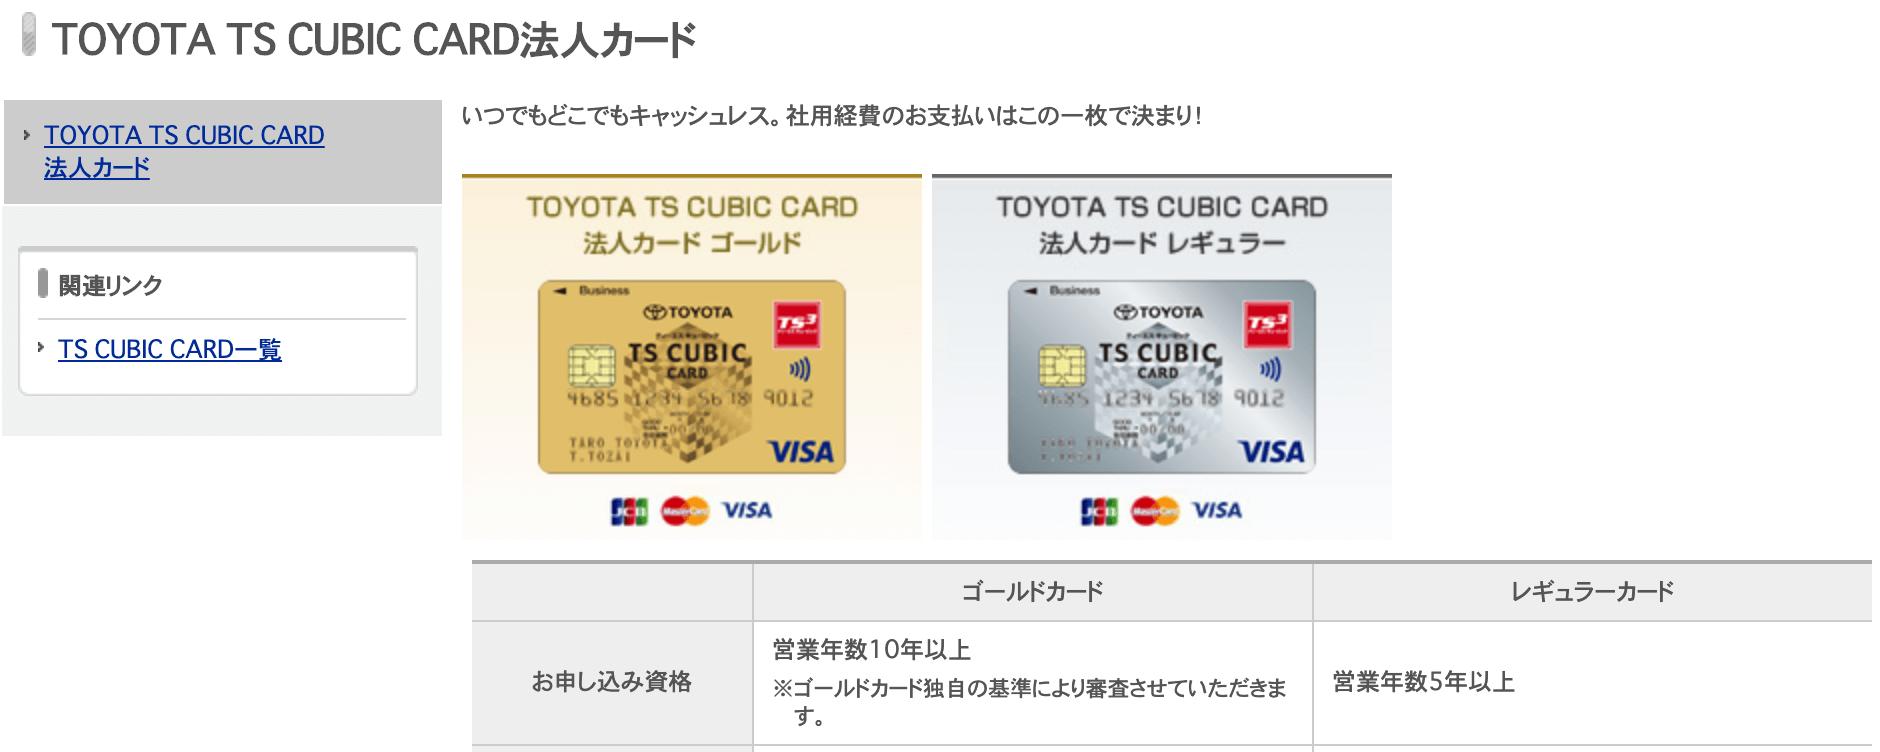 TOYOTA TS CUBIC CARD法人カードの申し込み条件